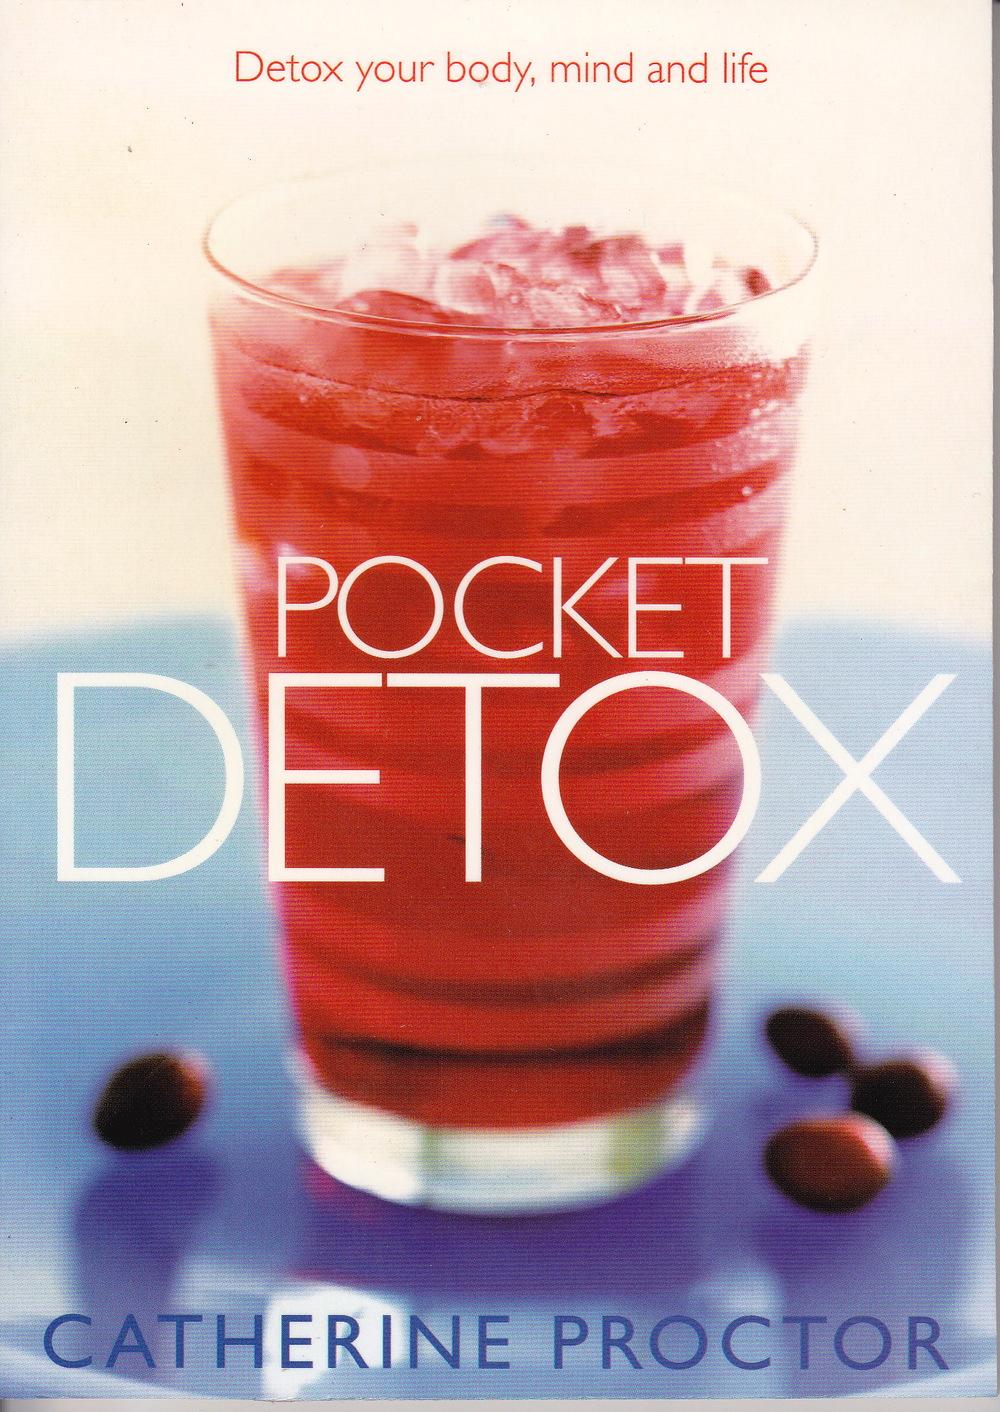 Pocket-Detox